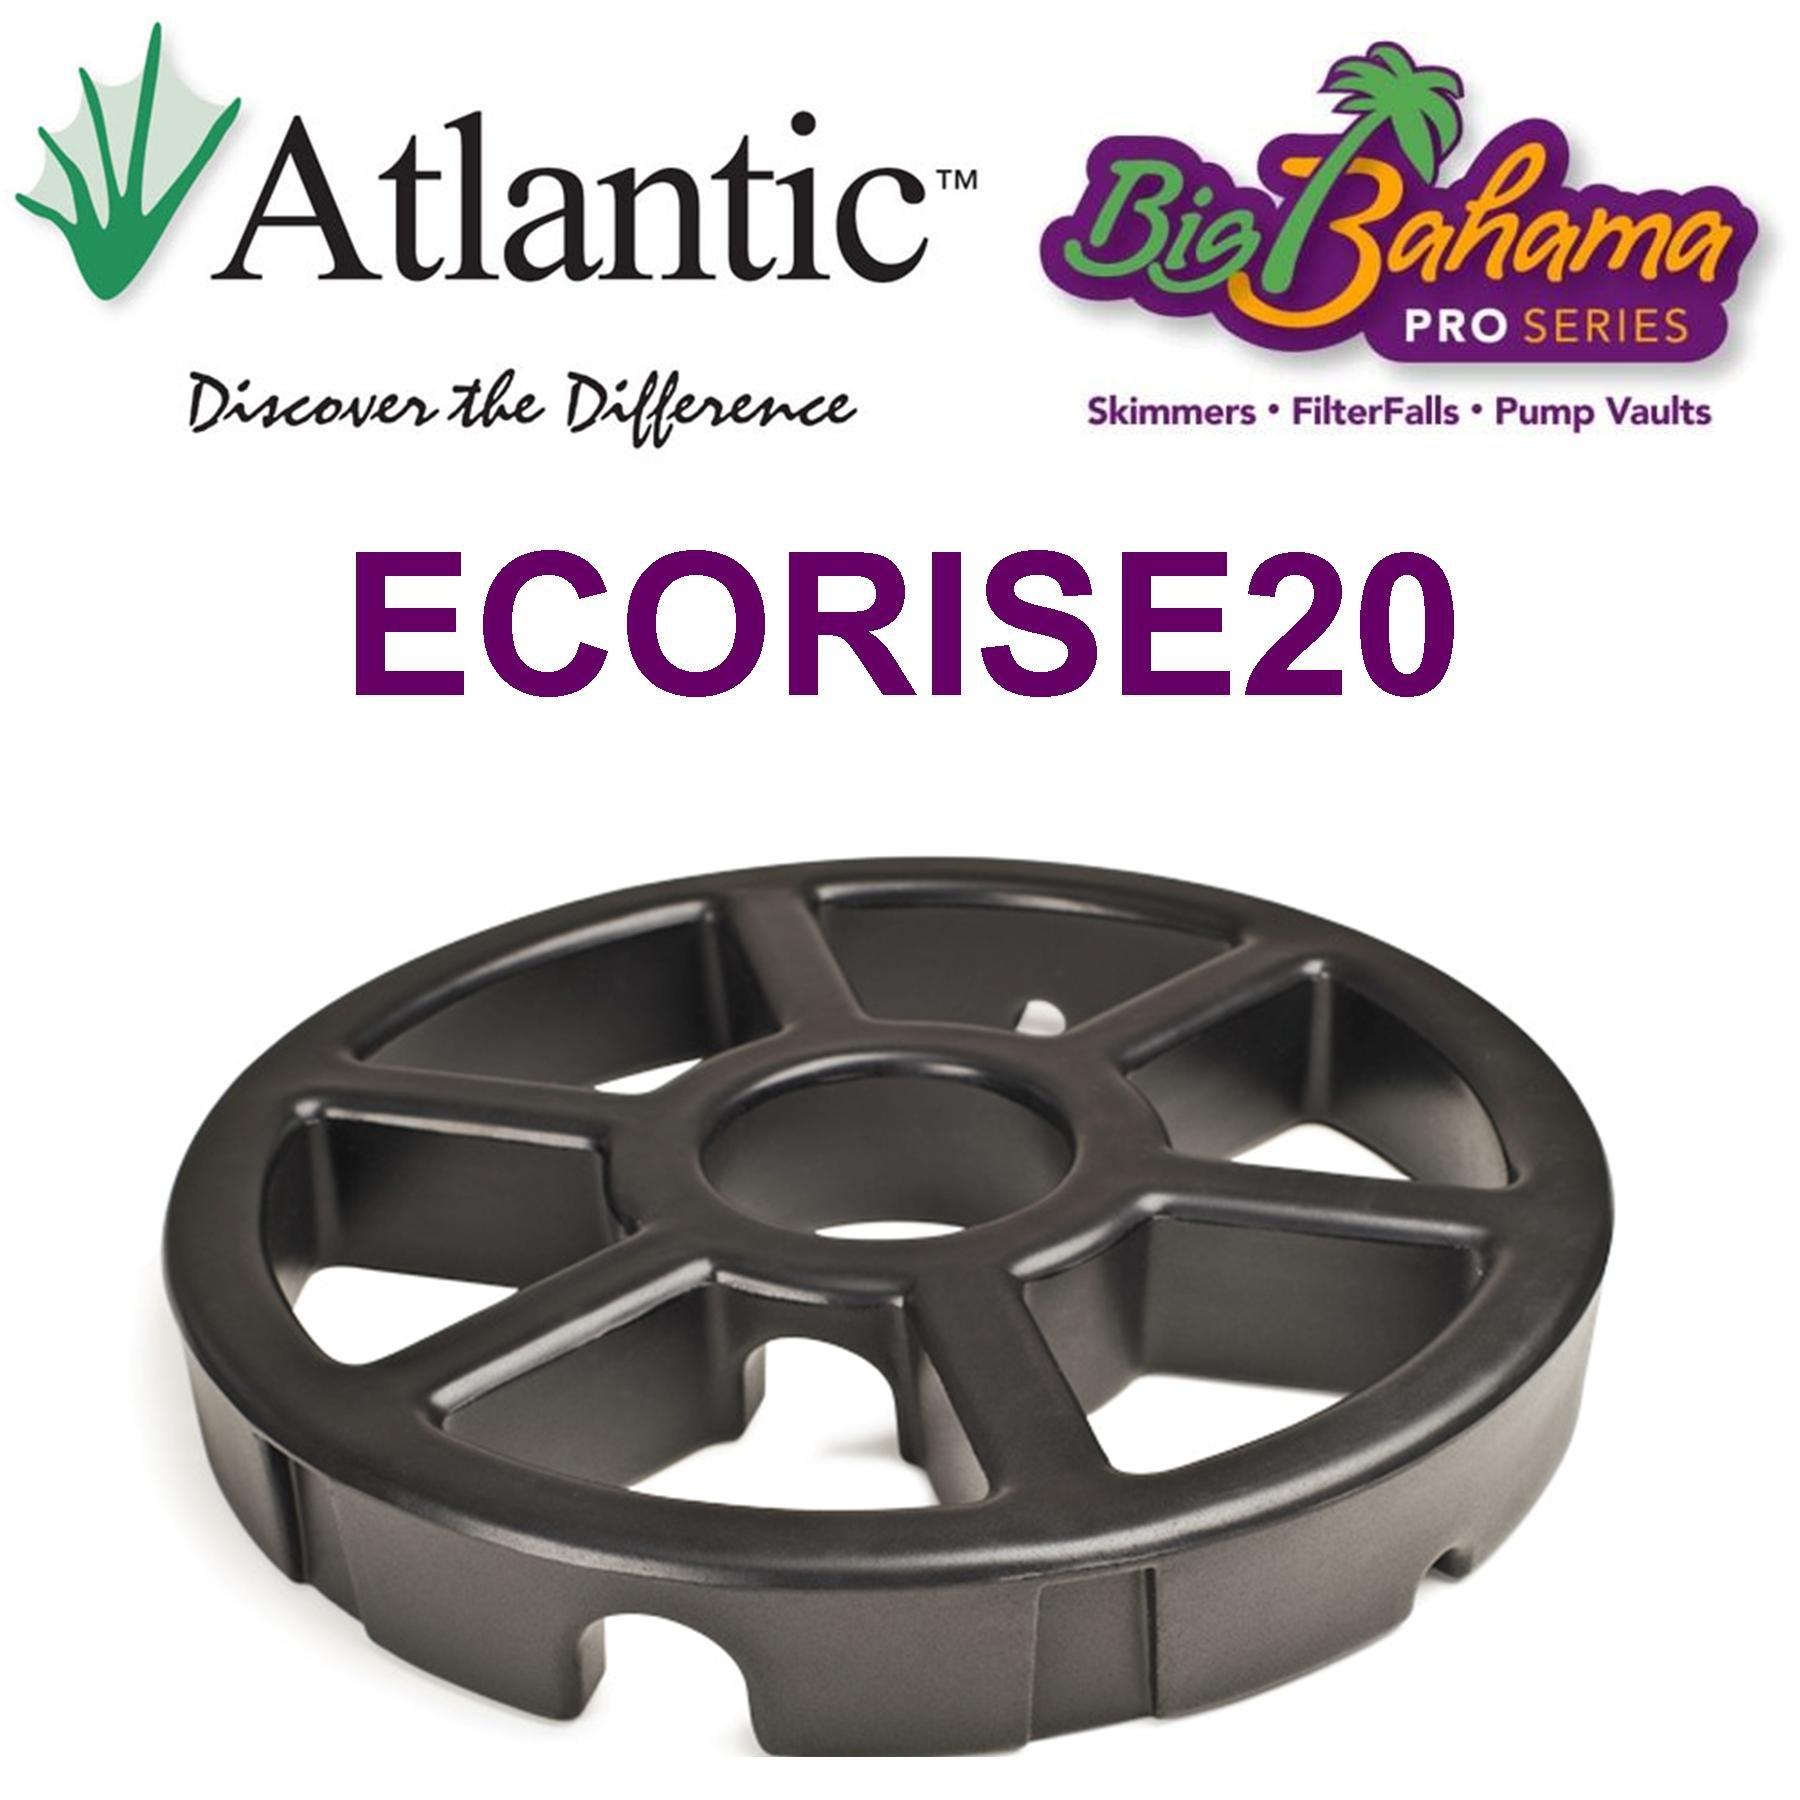 Atlantic Water Gardens Water Feature Riser, Eco-Rise